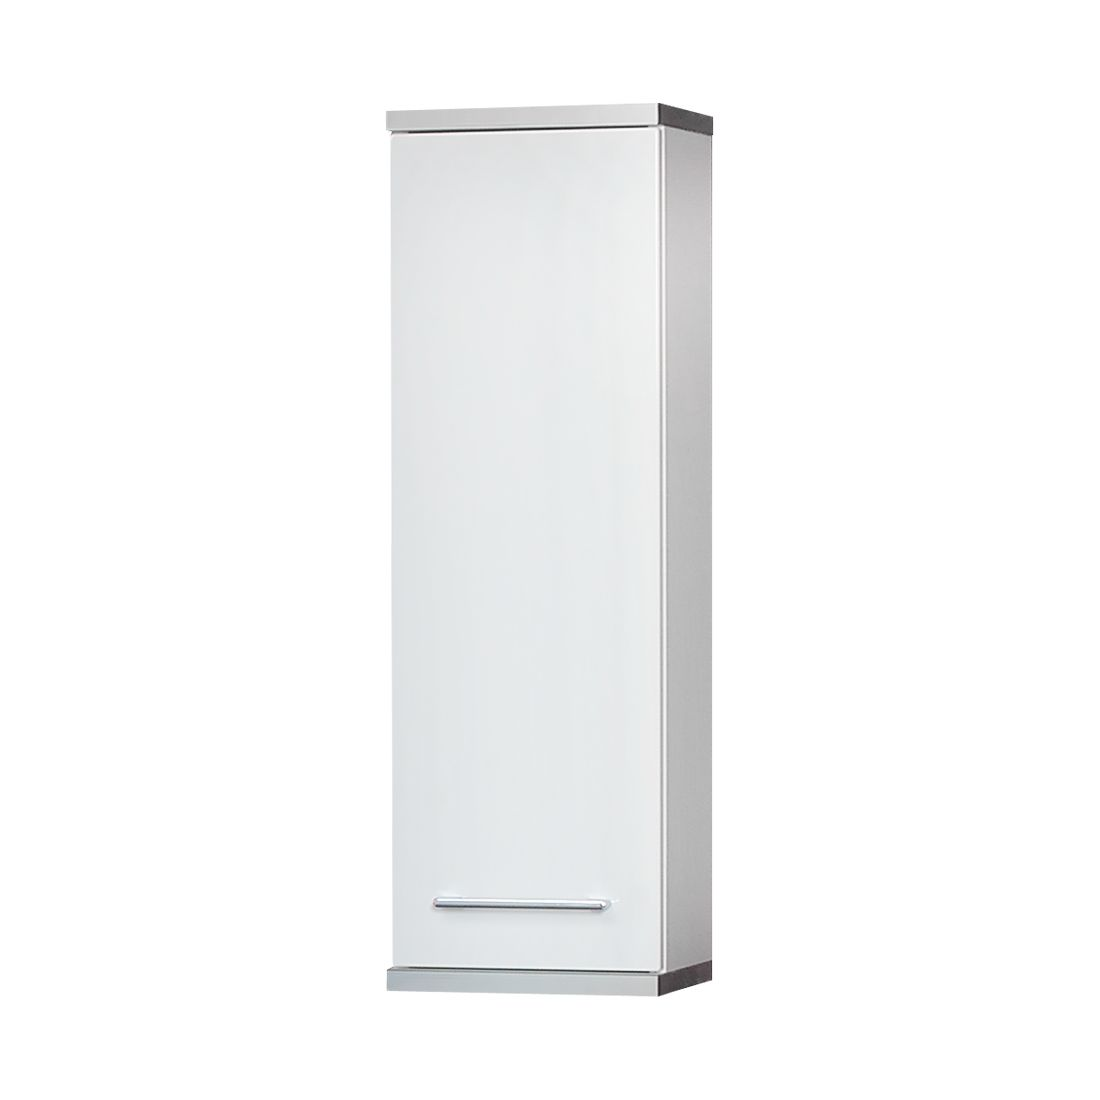 Armoire suspendue Gela - 1 porte - Blanc brillant, Kesper Badmöbel